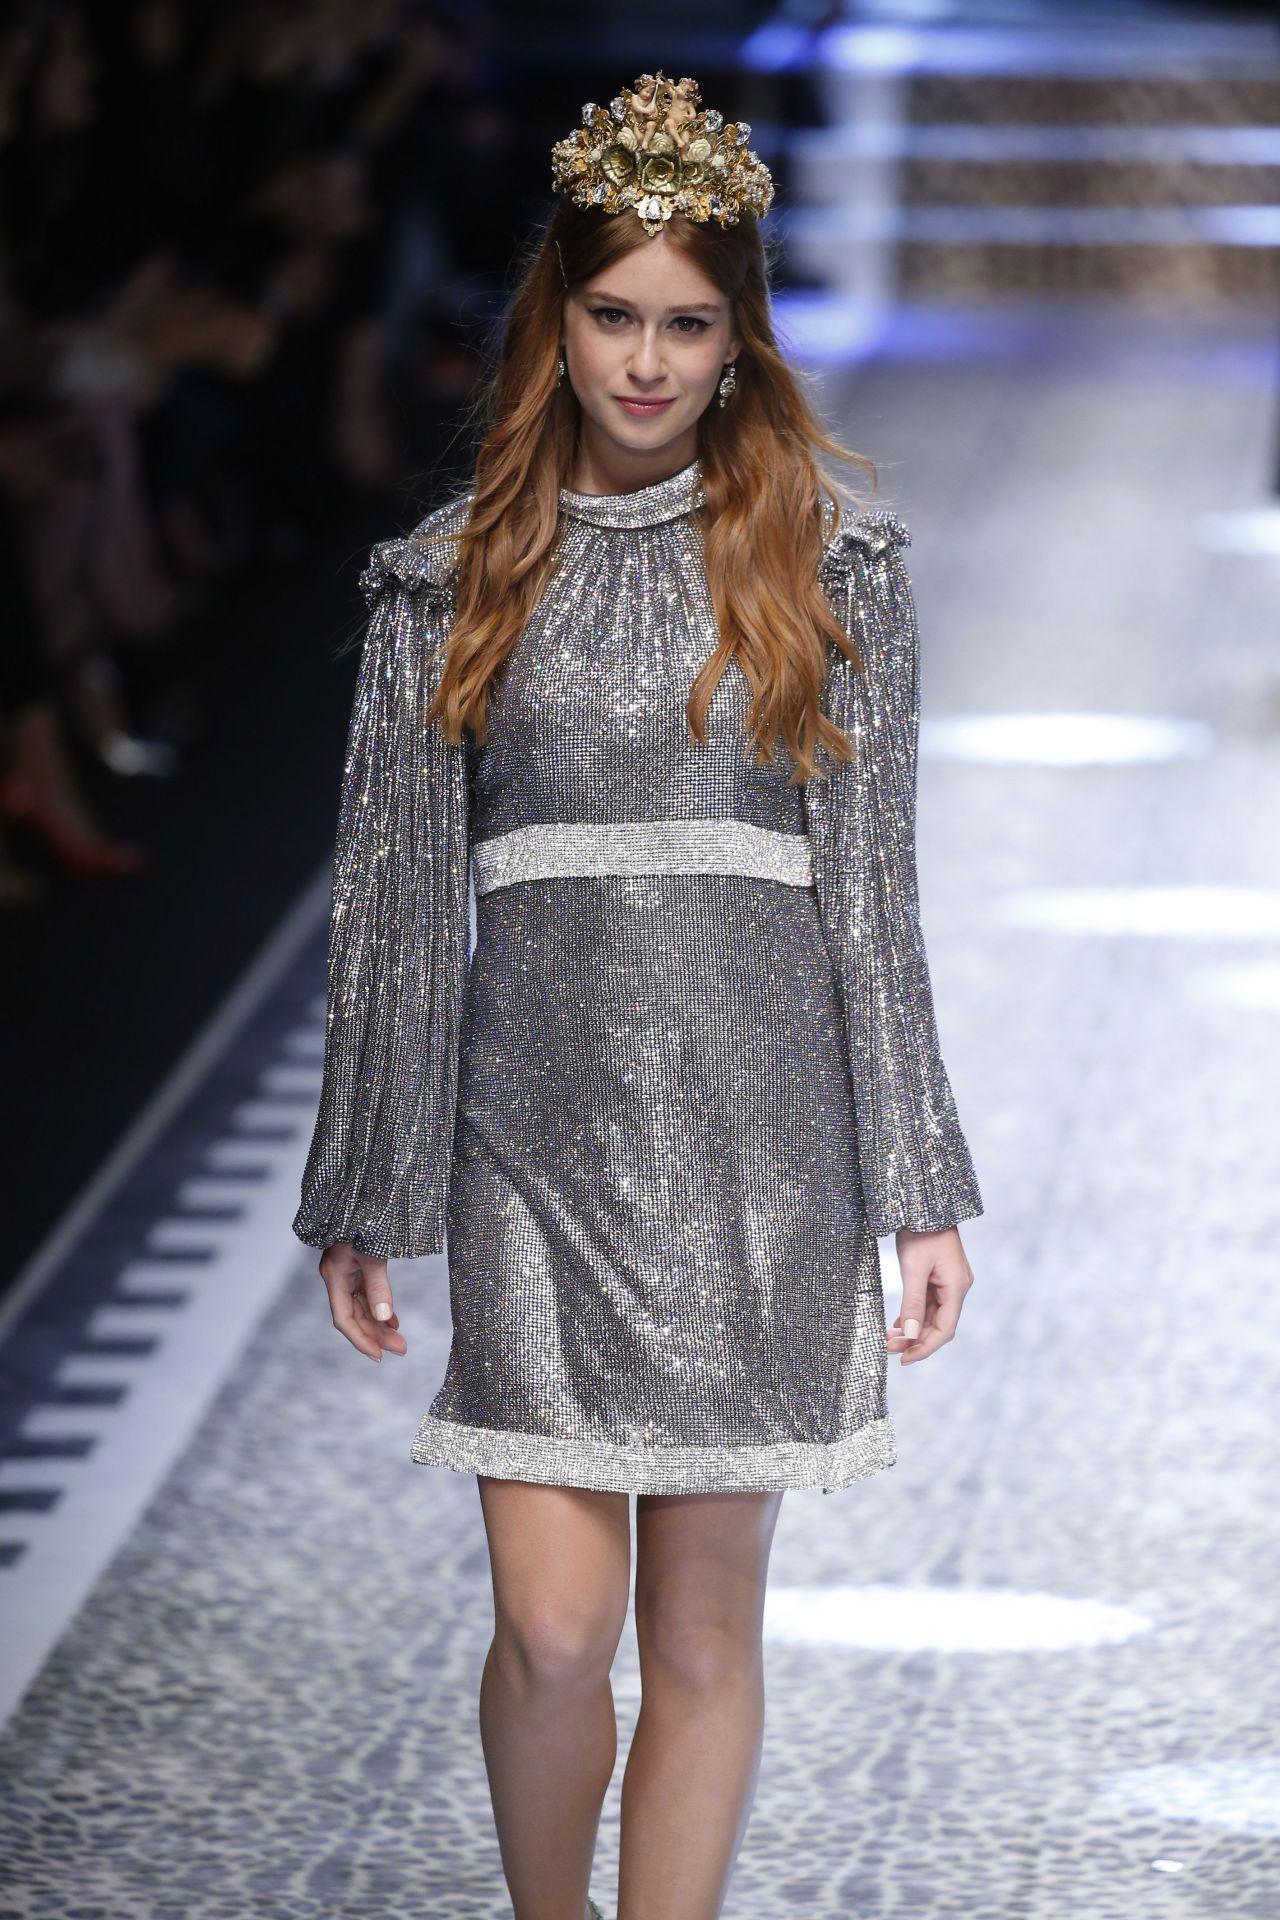 February Nyc Fashion Week